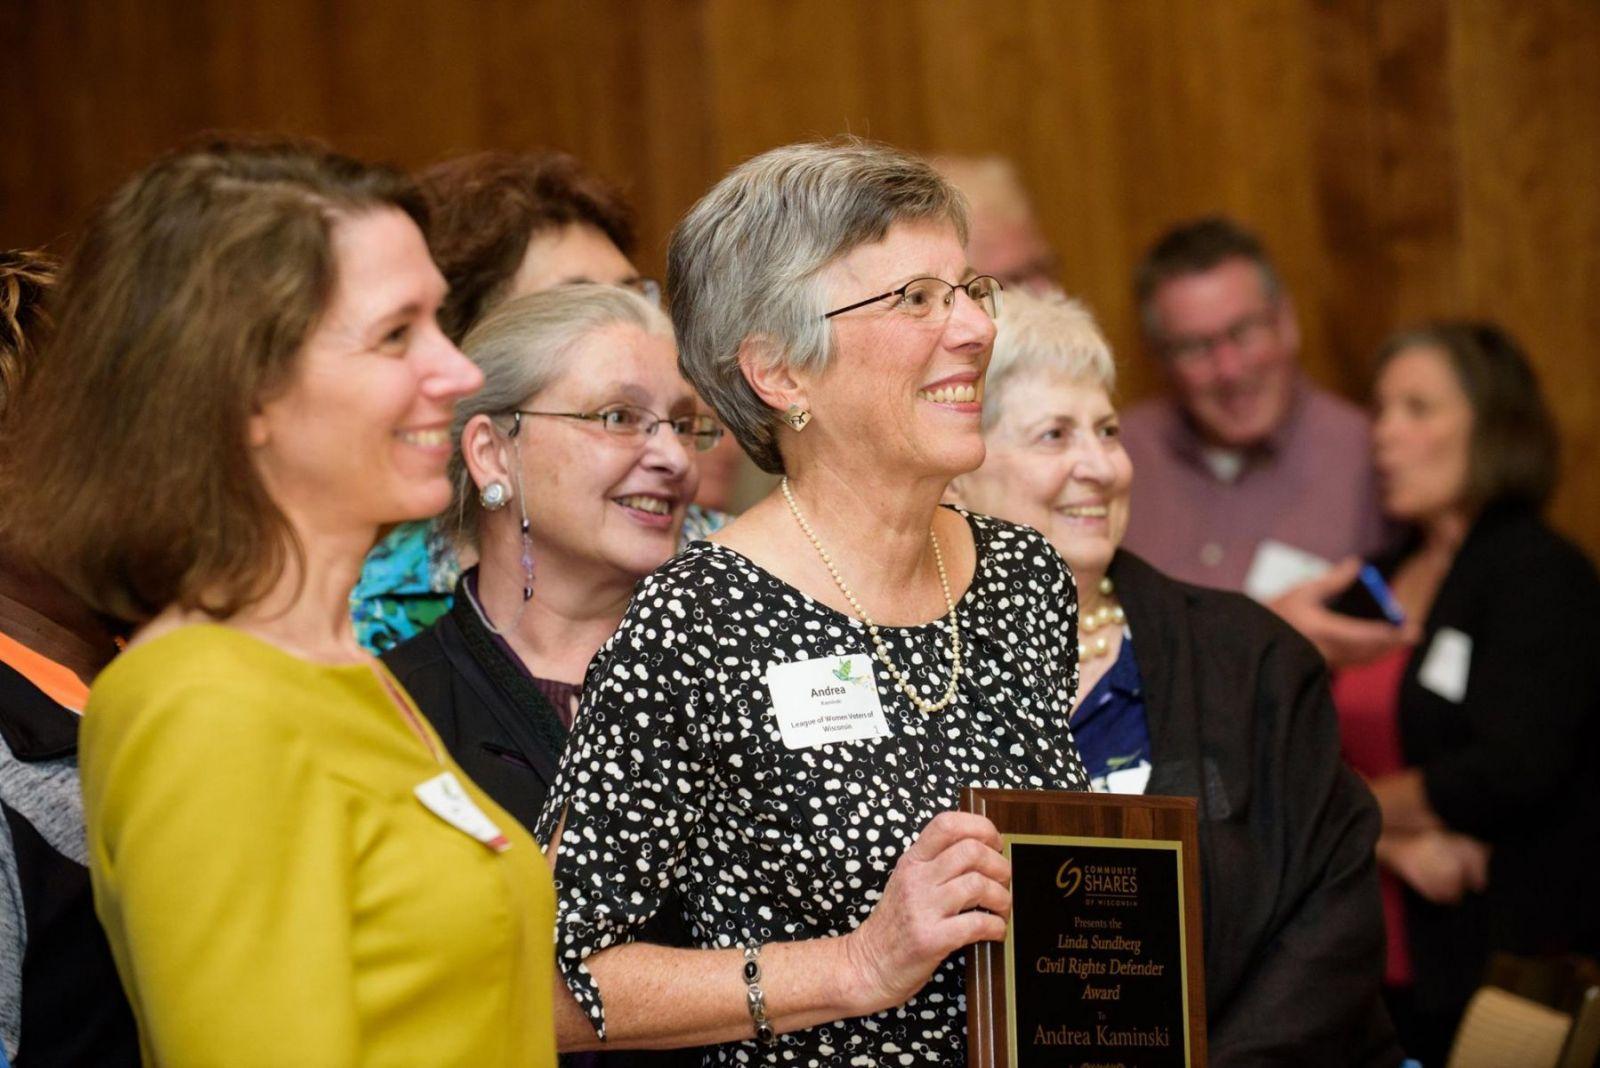 change makers award photo